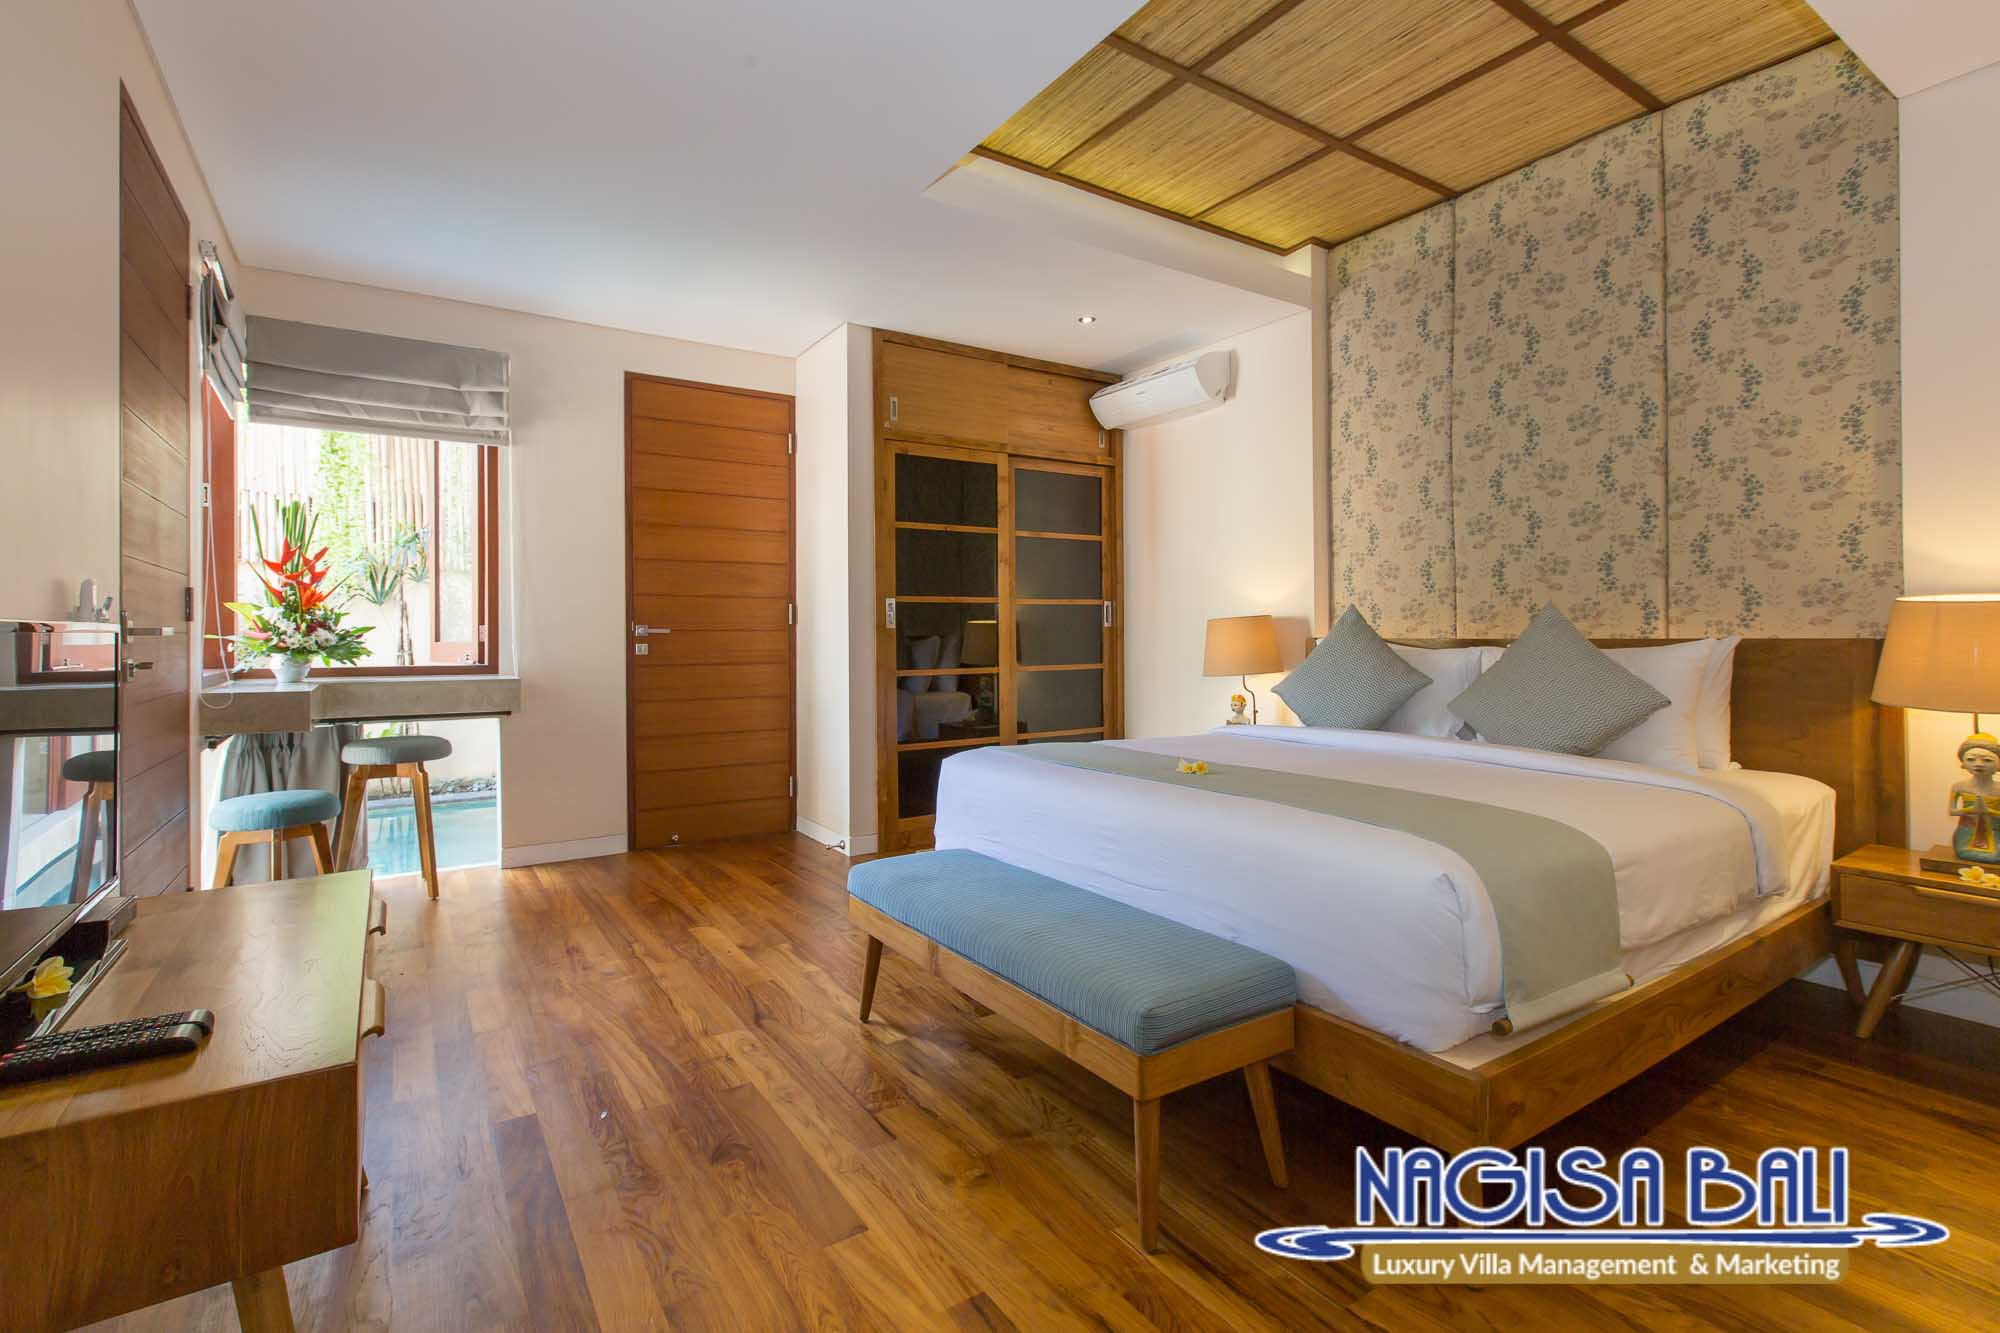 2-Bedroom Villa in Seminyak, Bali